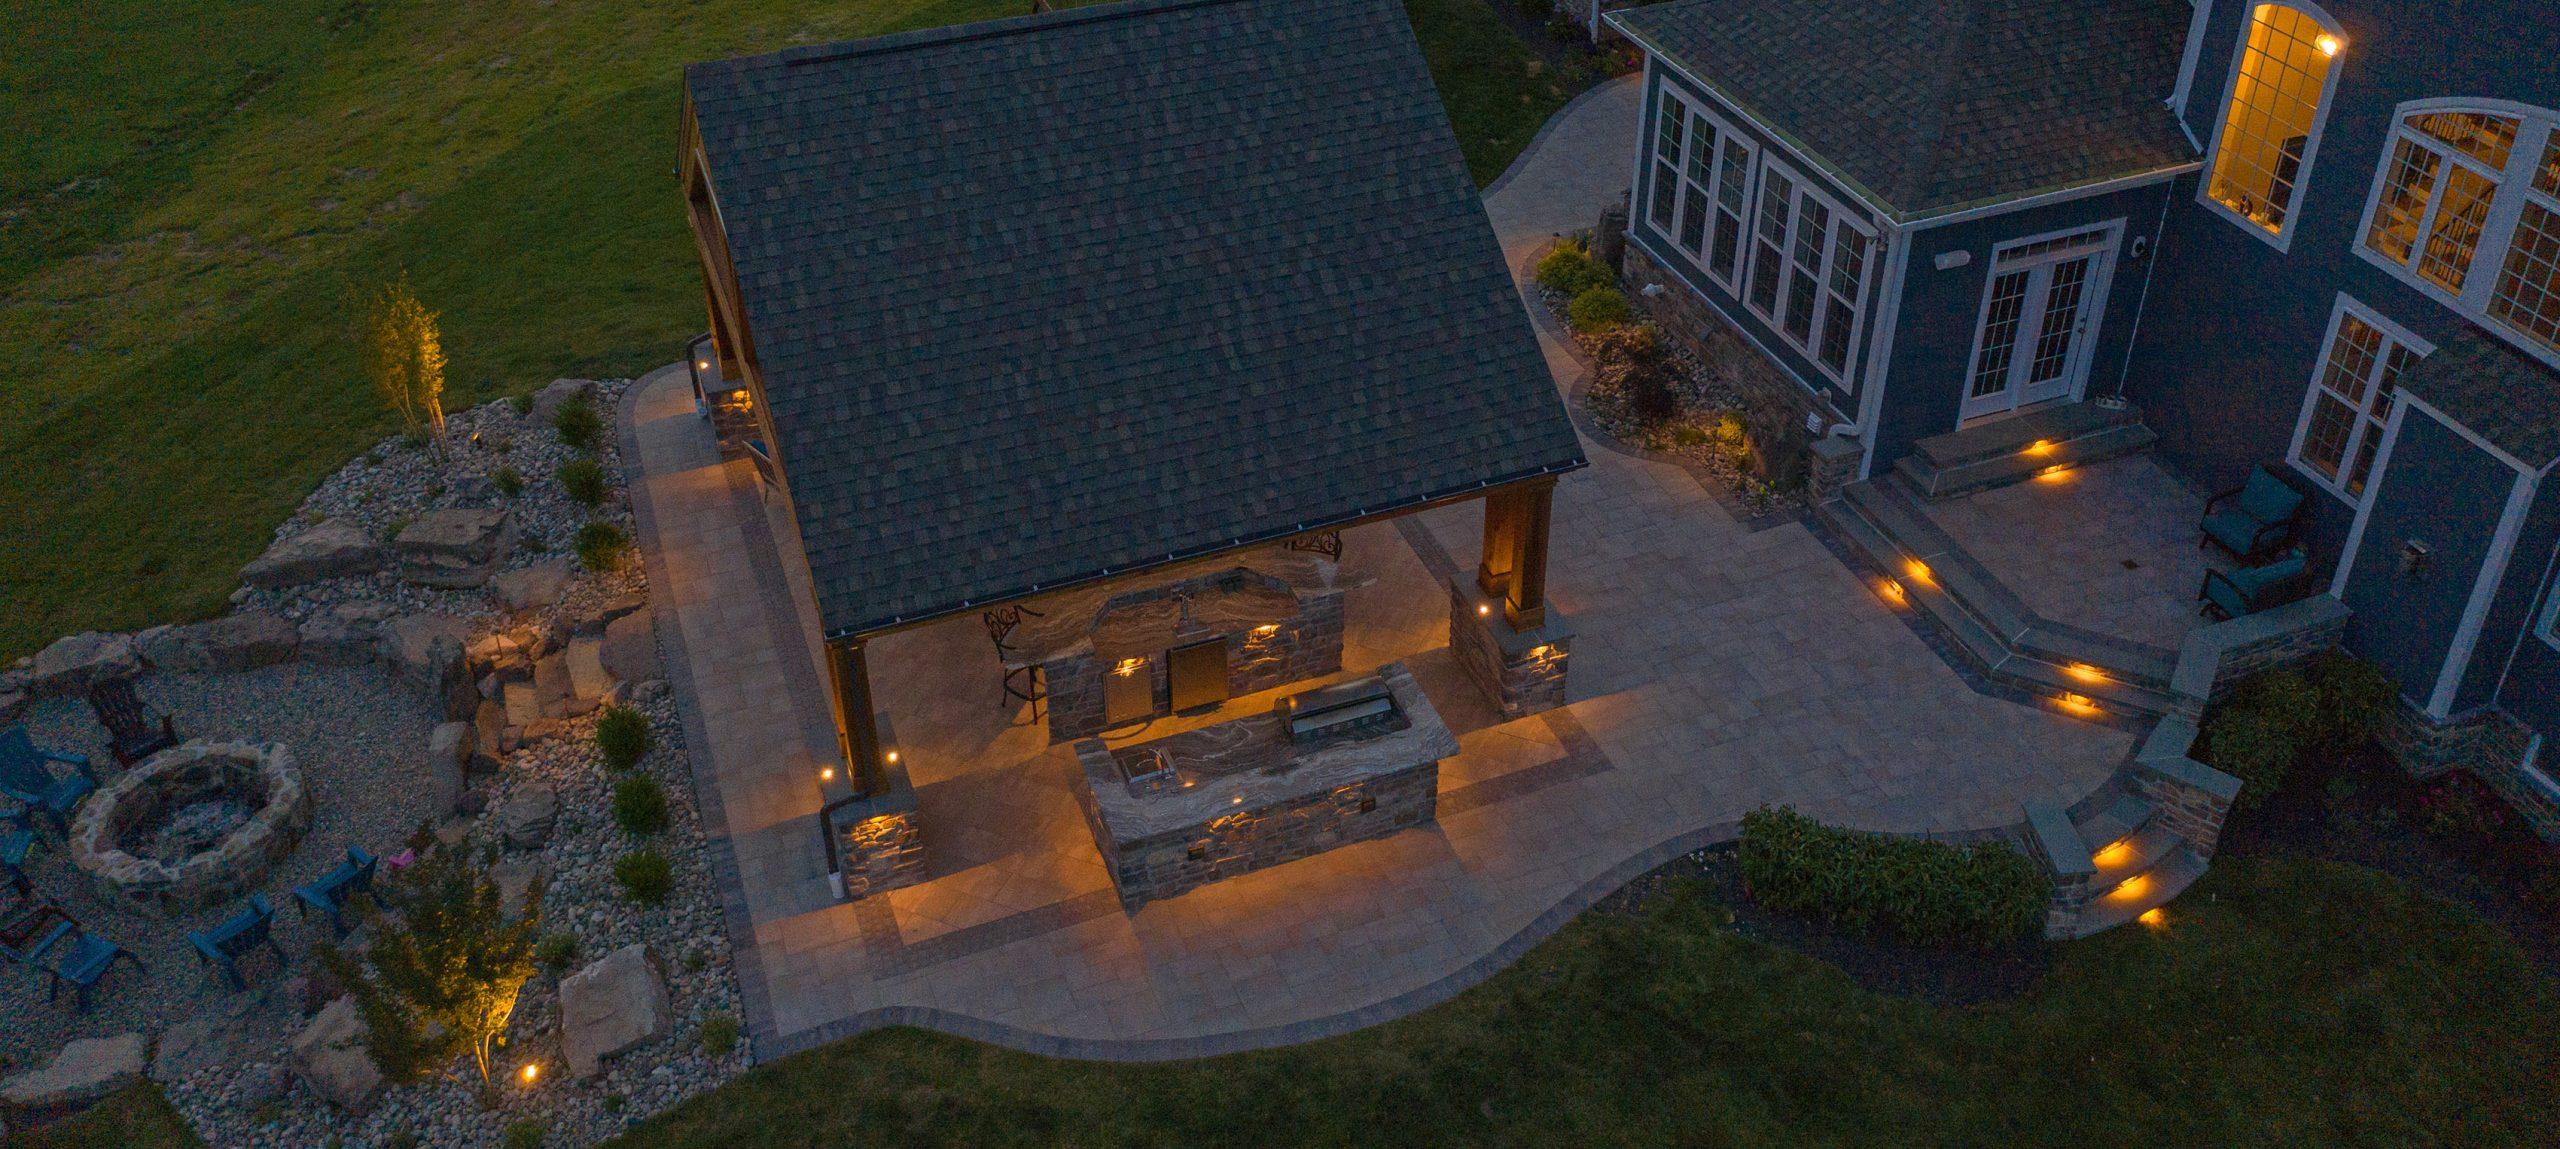 outdoor-lighting-installation-services